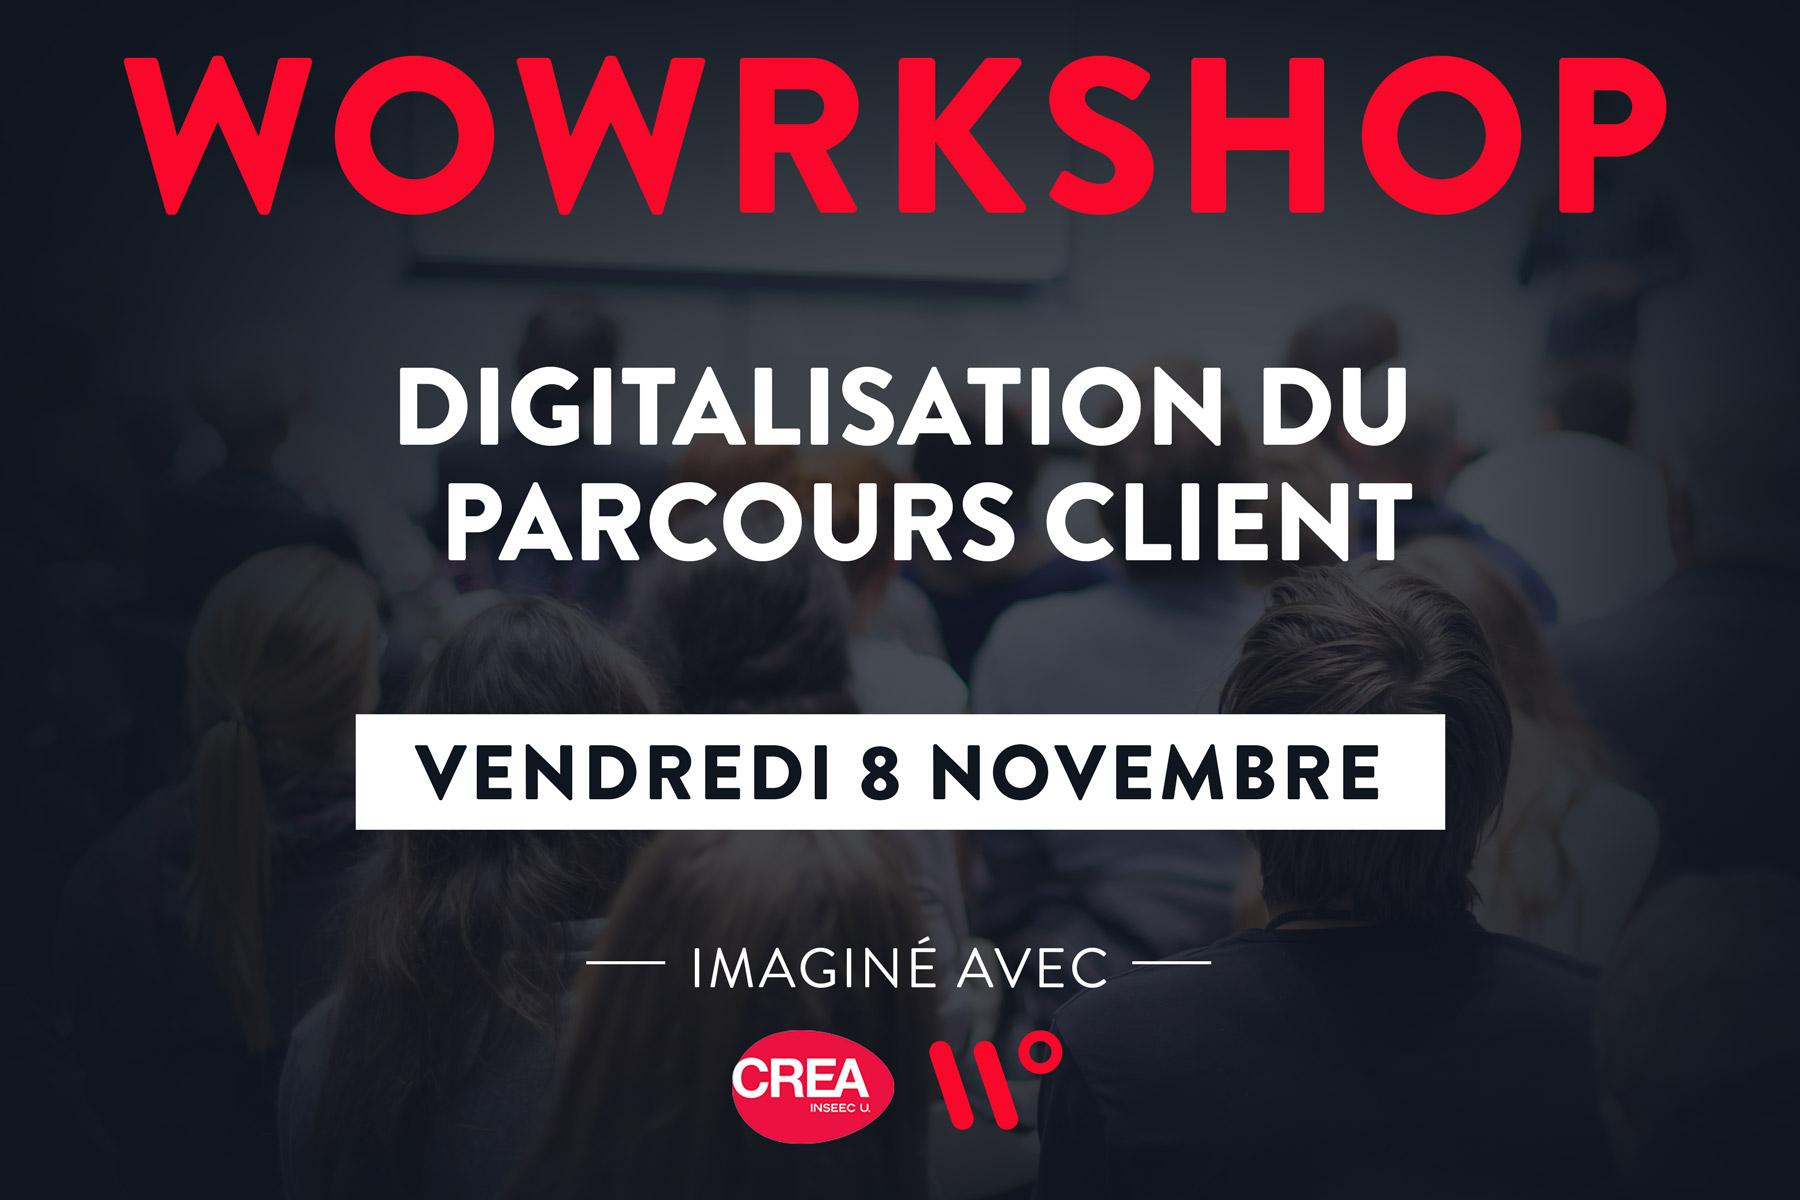 wowrkshop-crea-event